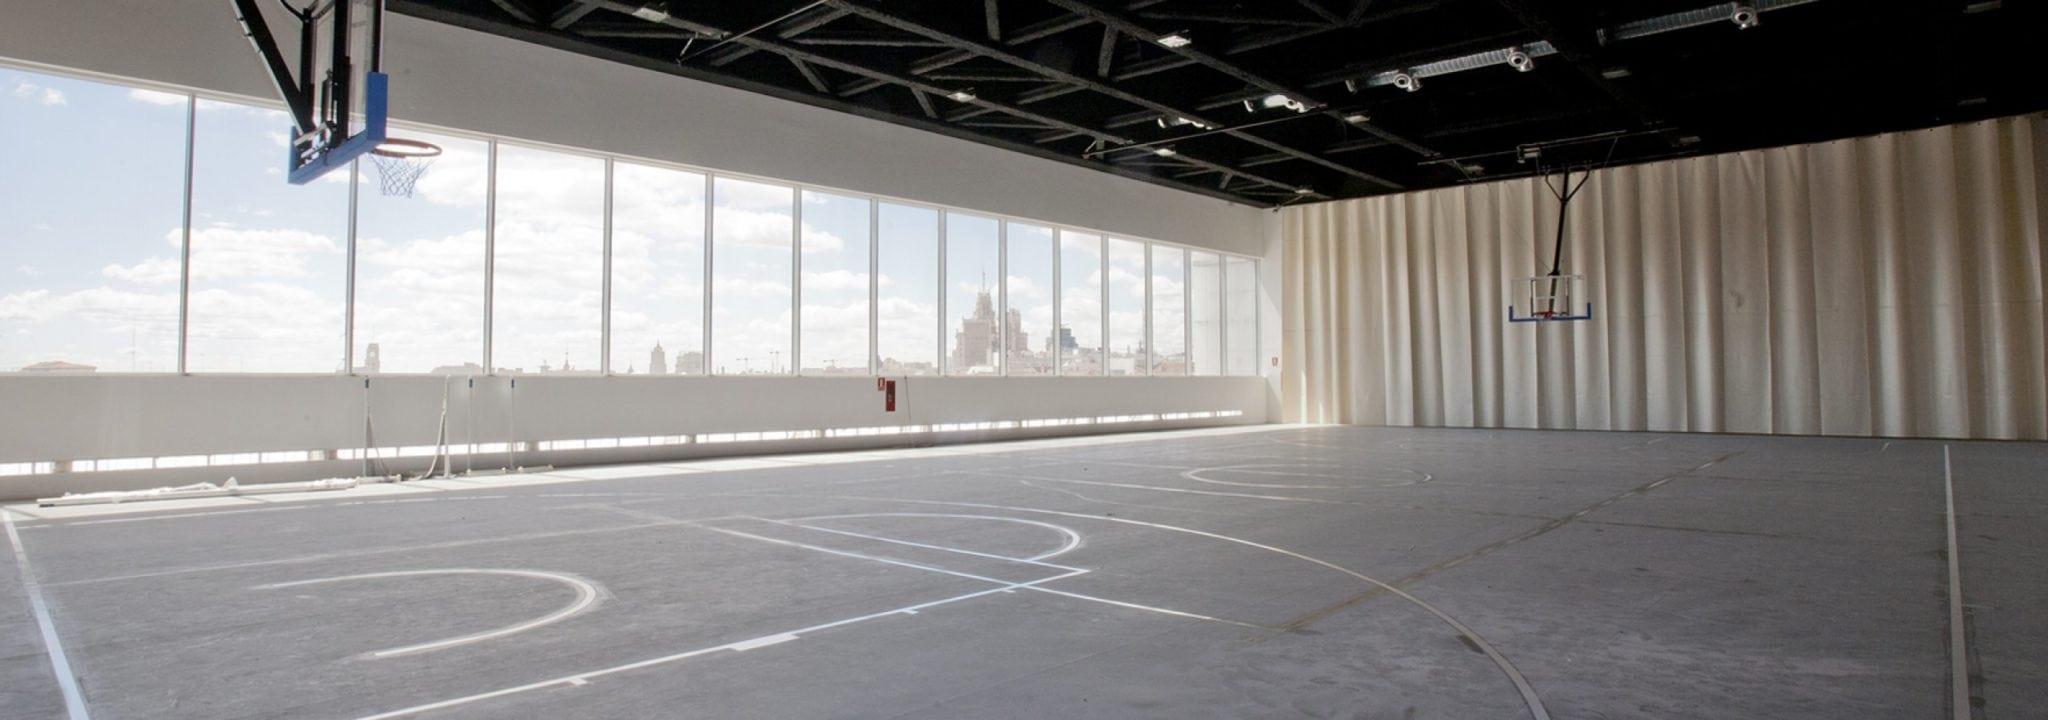 Llega a Barceló (Malasaña) la Escuela de Baloncesto de Movistar Estudiantes